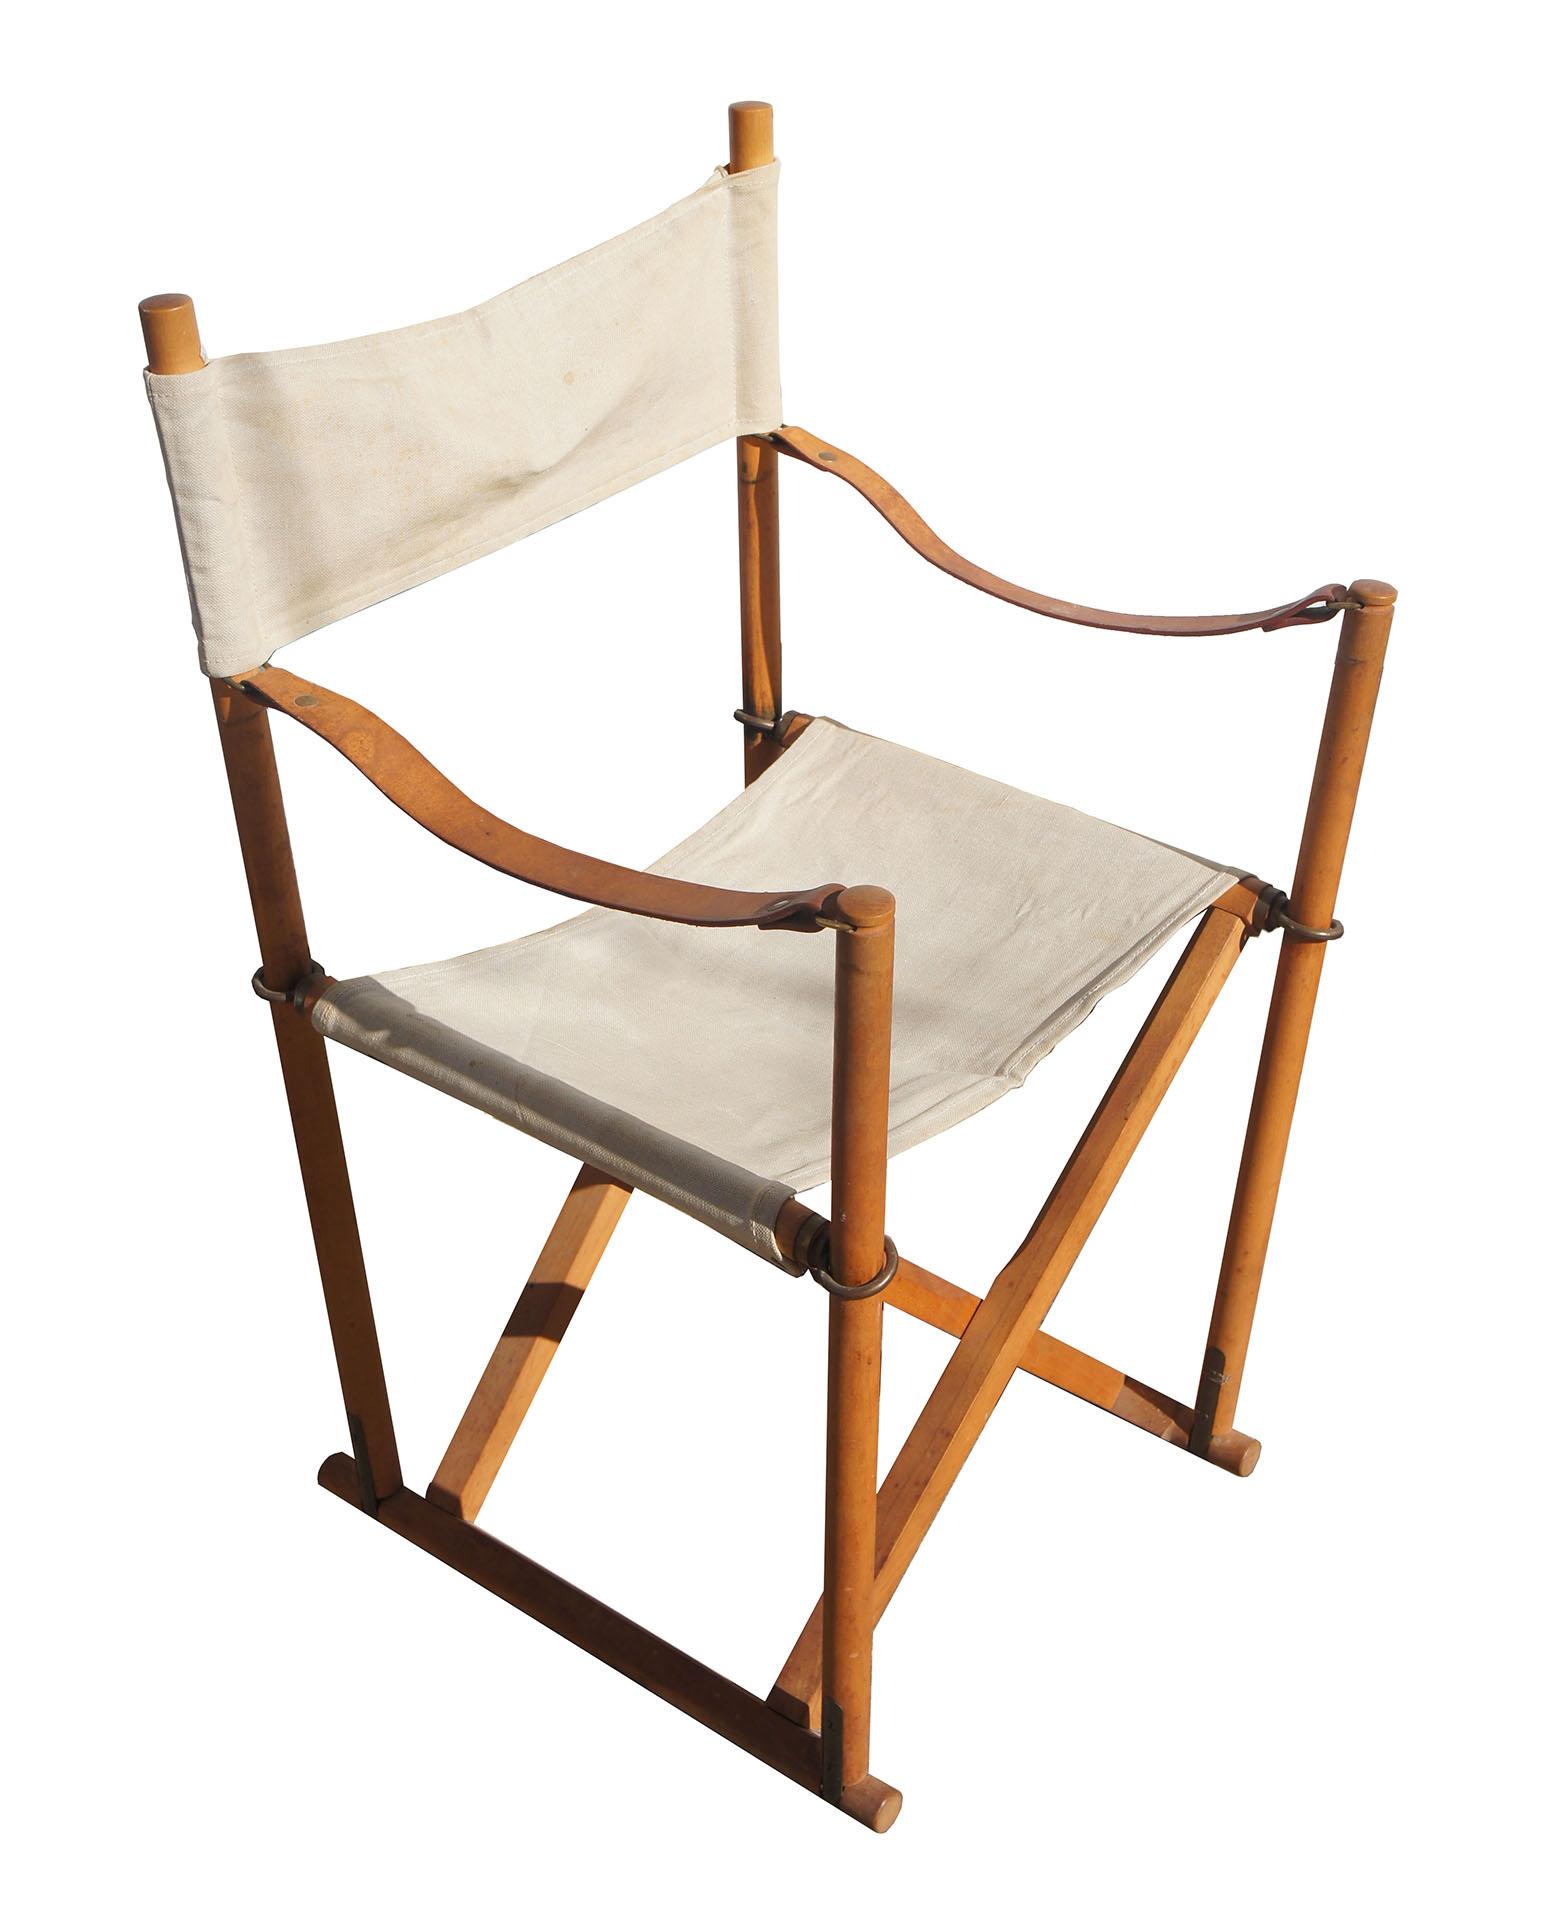 Folding CADO chair 1.jpg